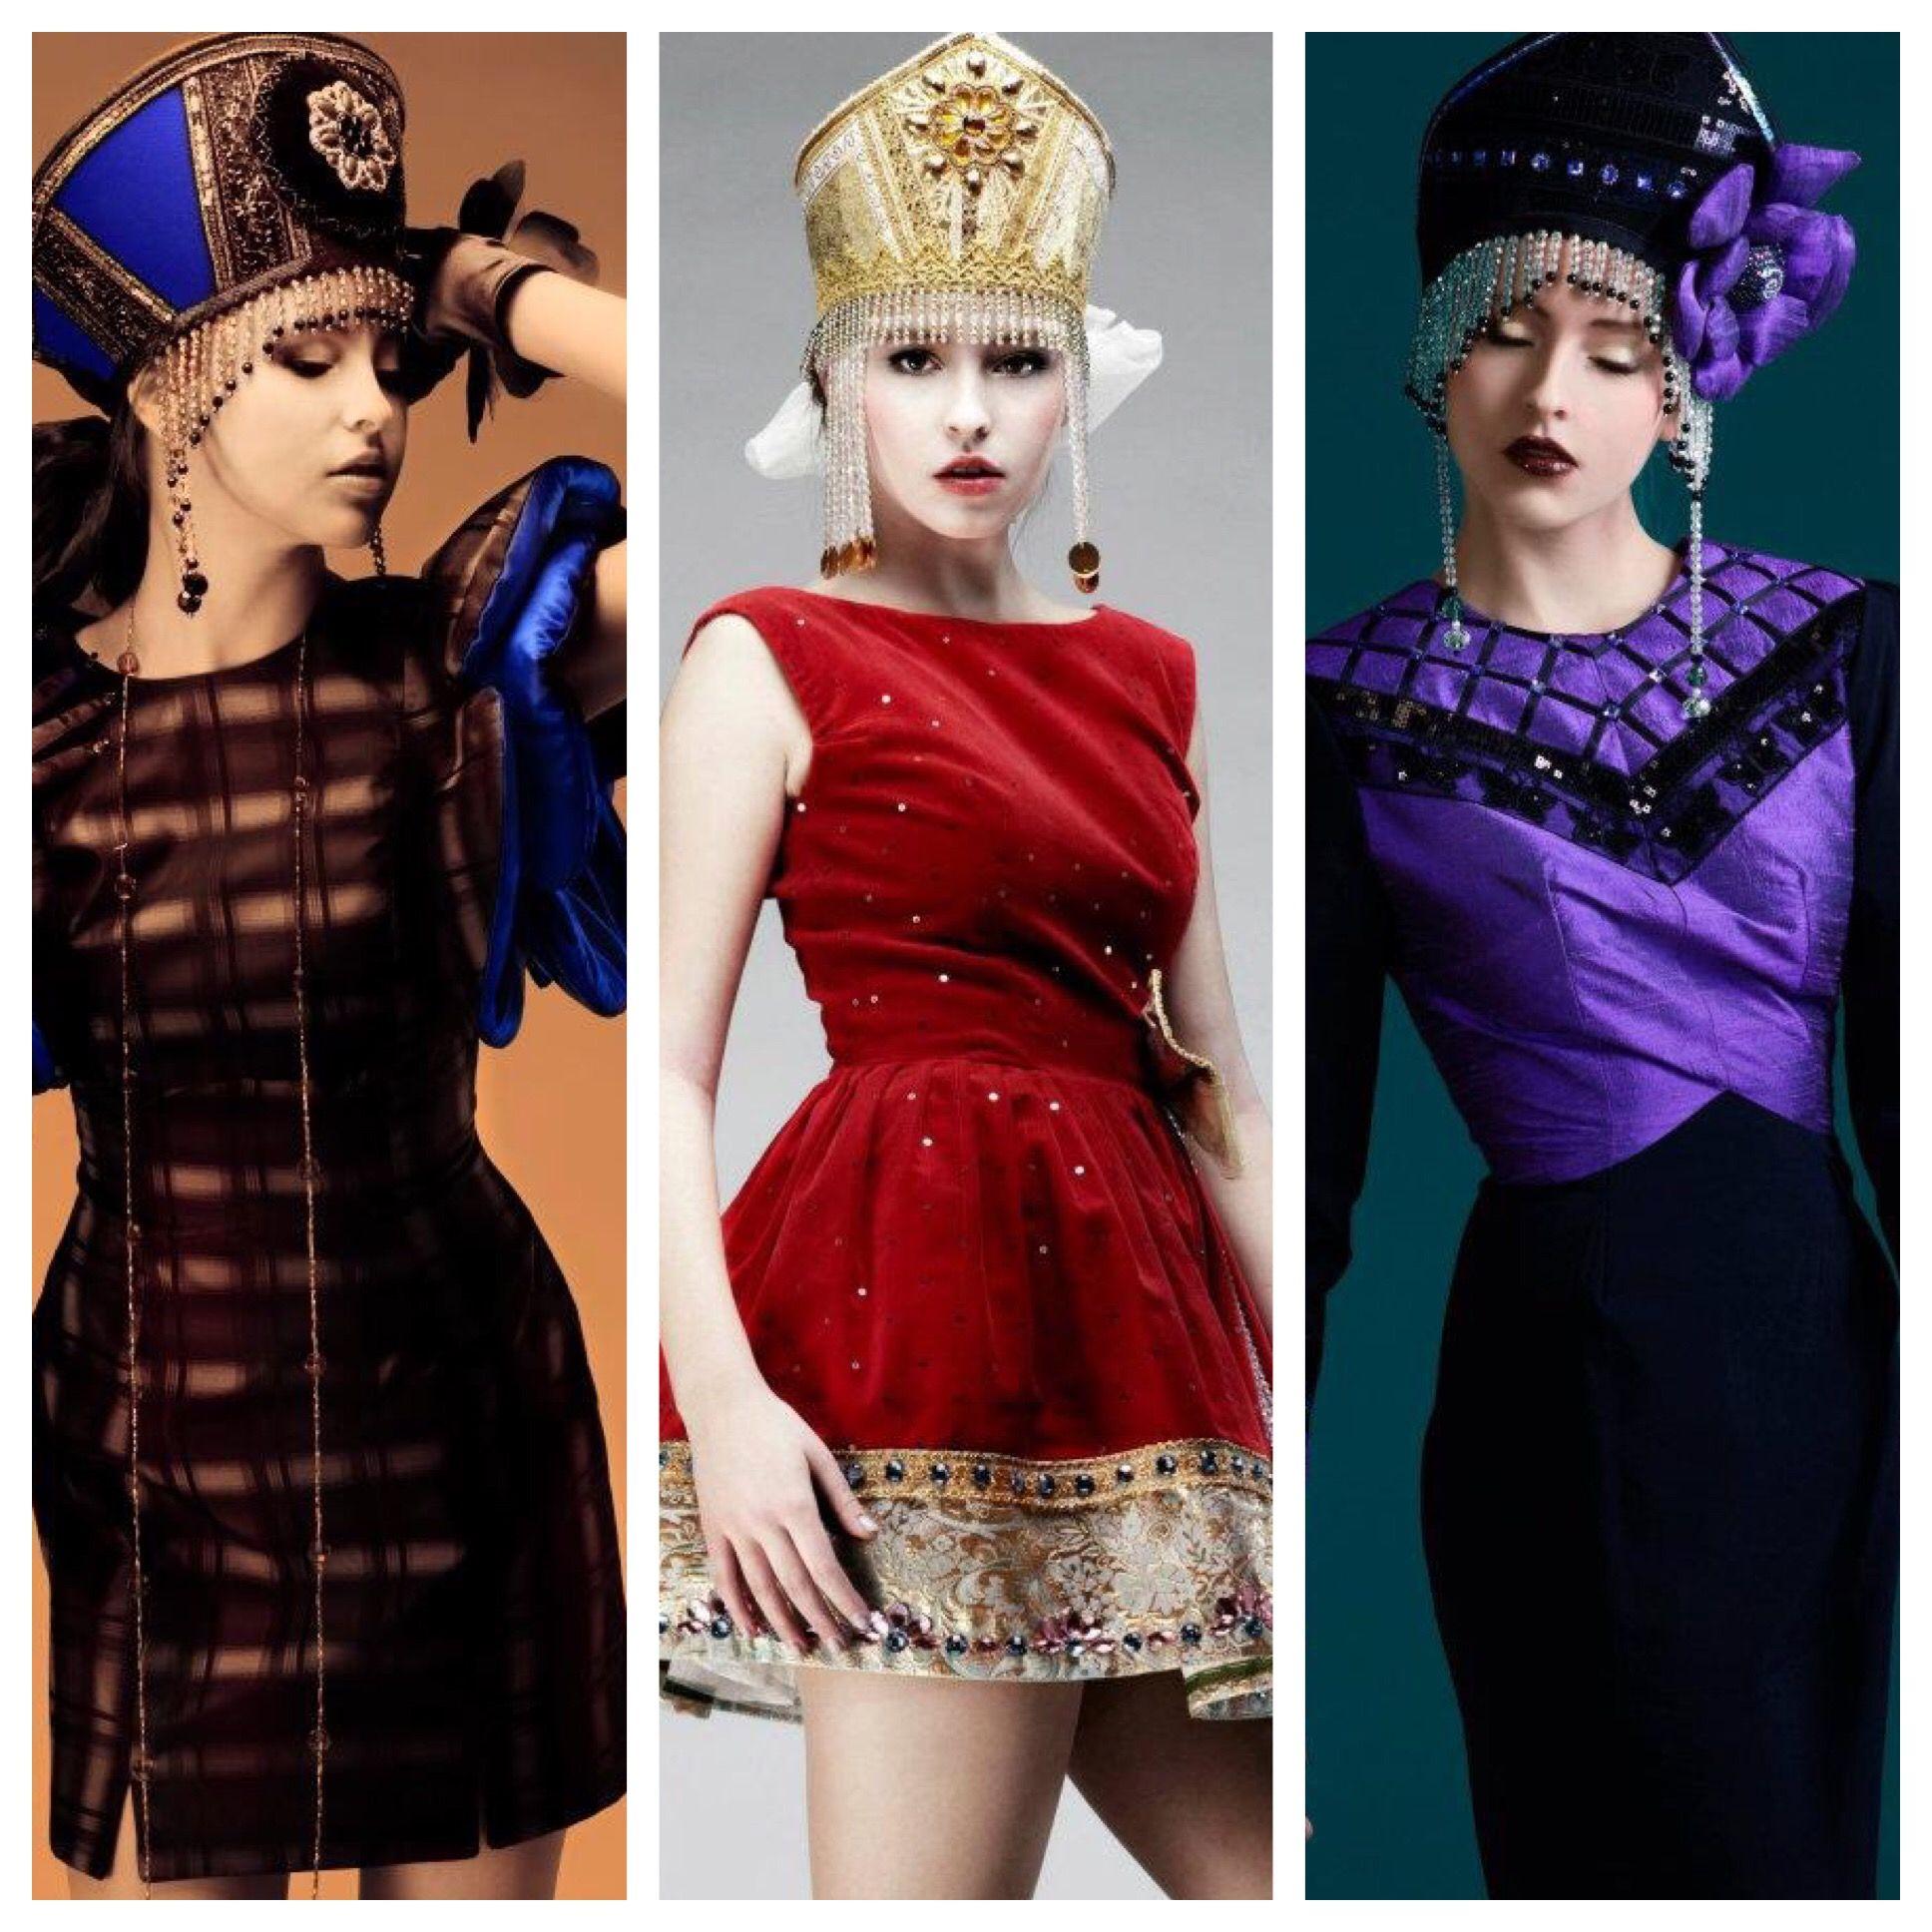 #hifashion #русскийдизайнер #kokoshnik #платьеврусскомстиле #русскийстиль #высокаямода #fashion #russianstyle  #неделямоды #jenkasfashion